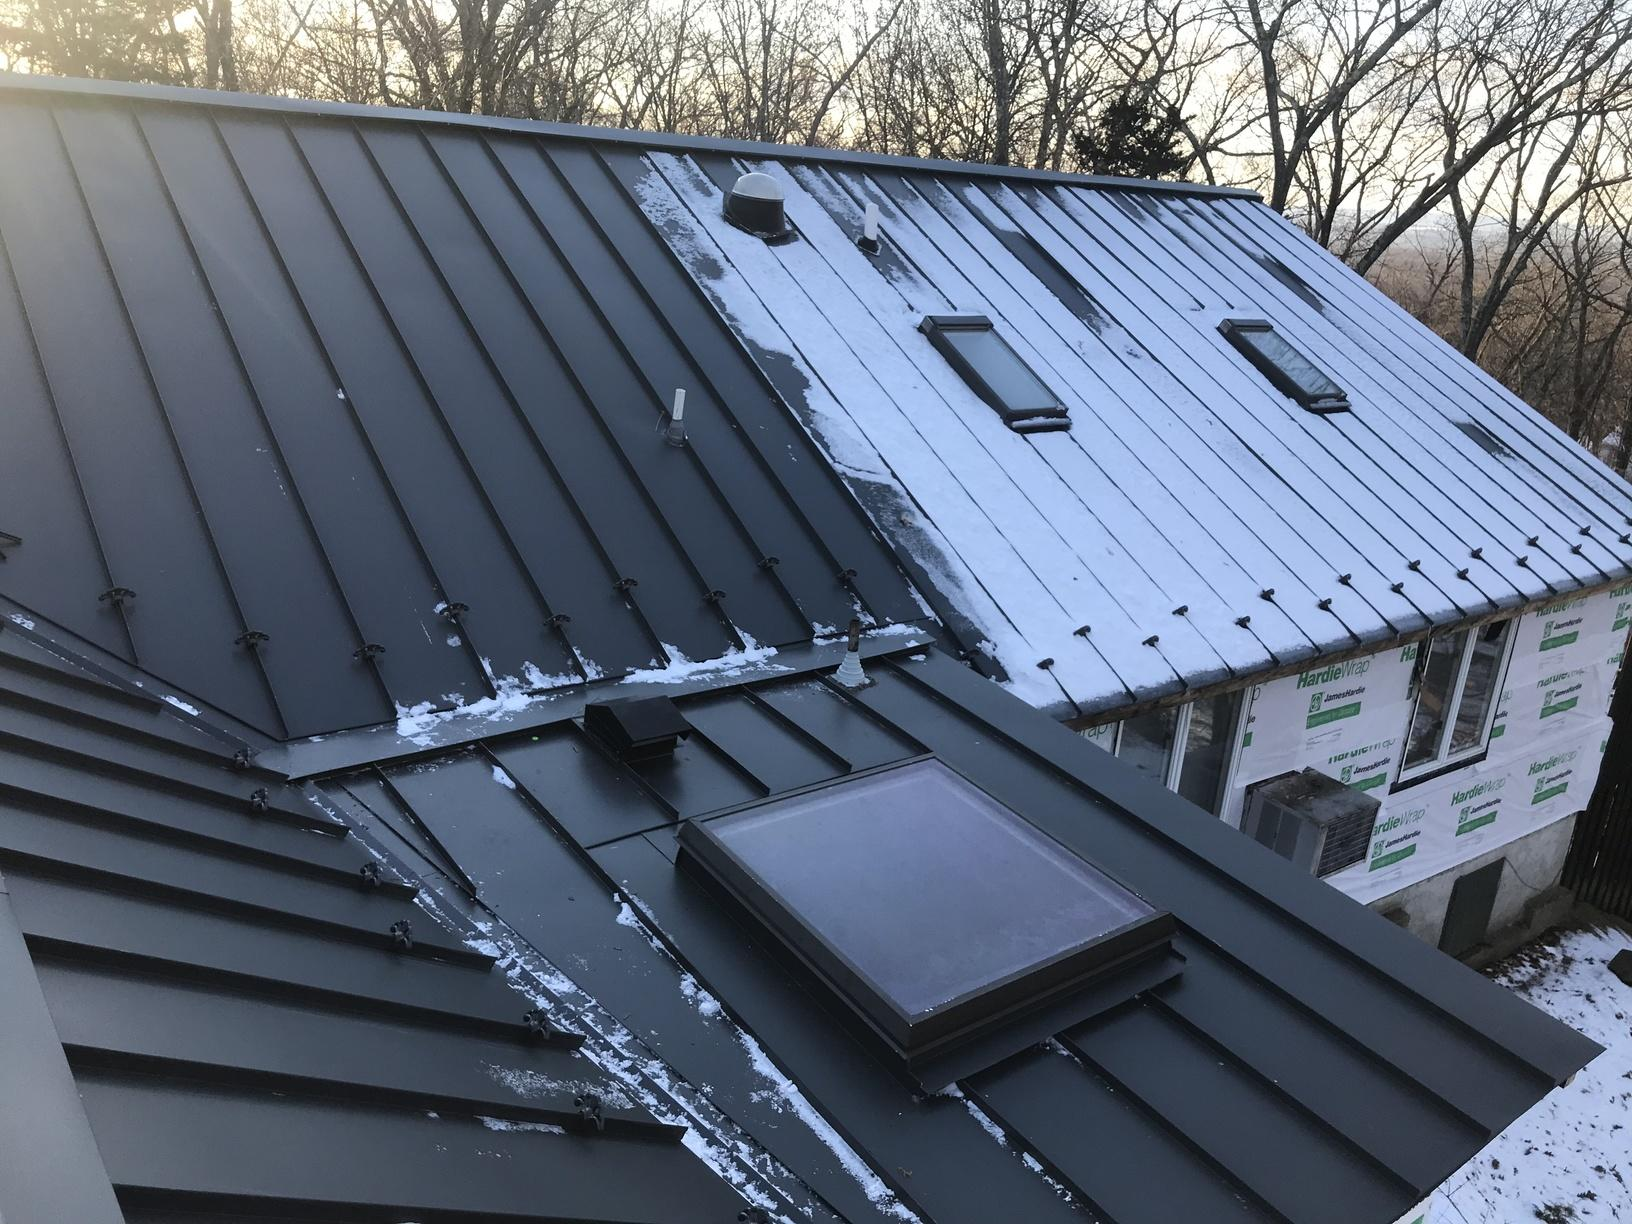 Drexel Standing Seam Metal Roof Installation in Sparta, NJ